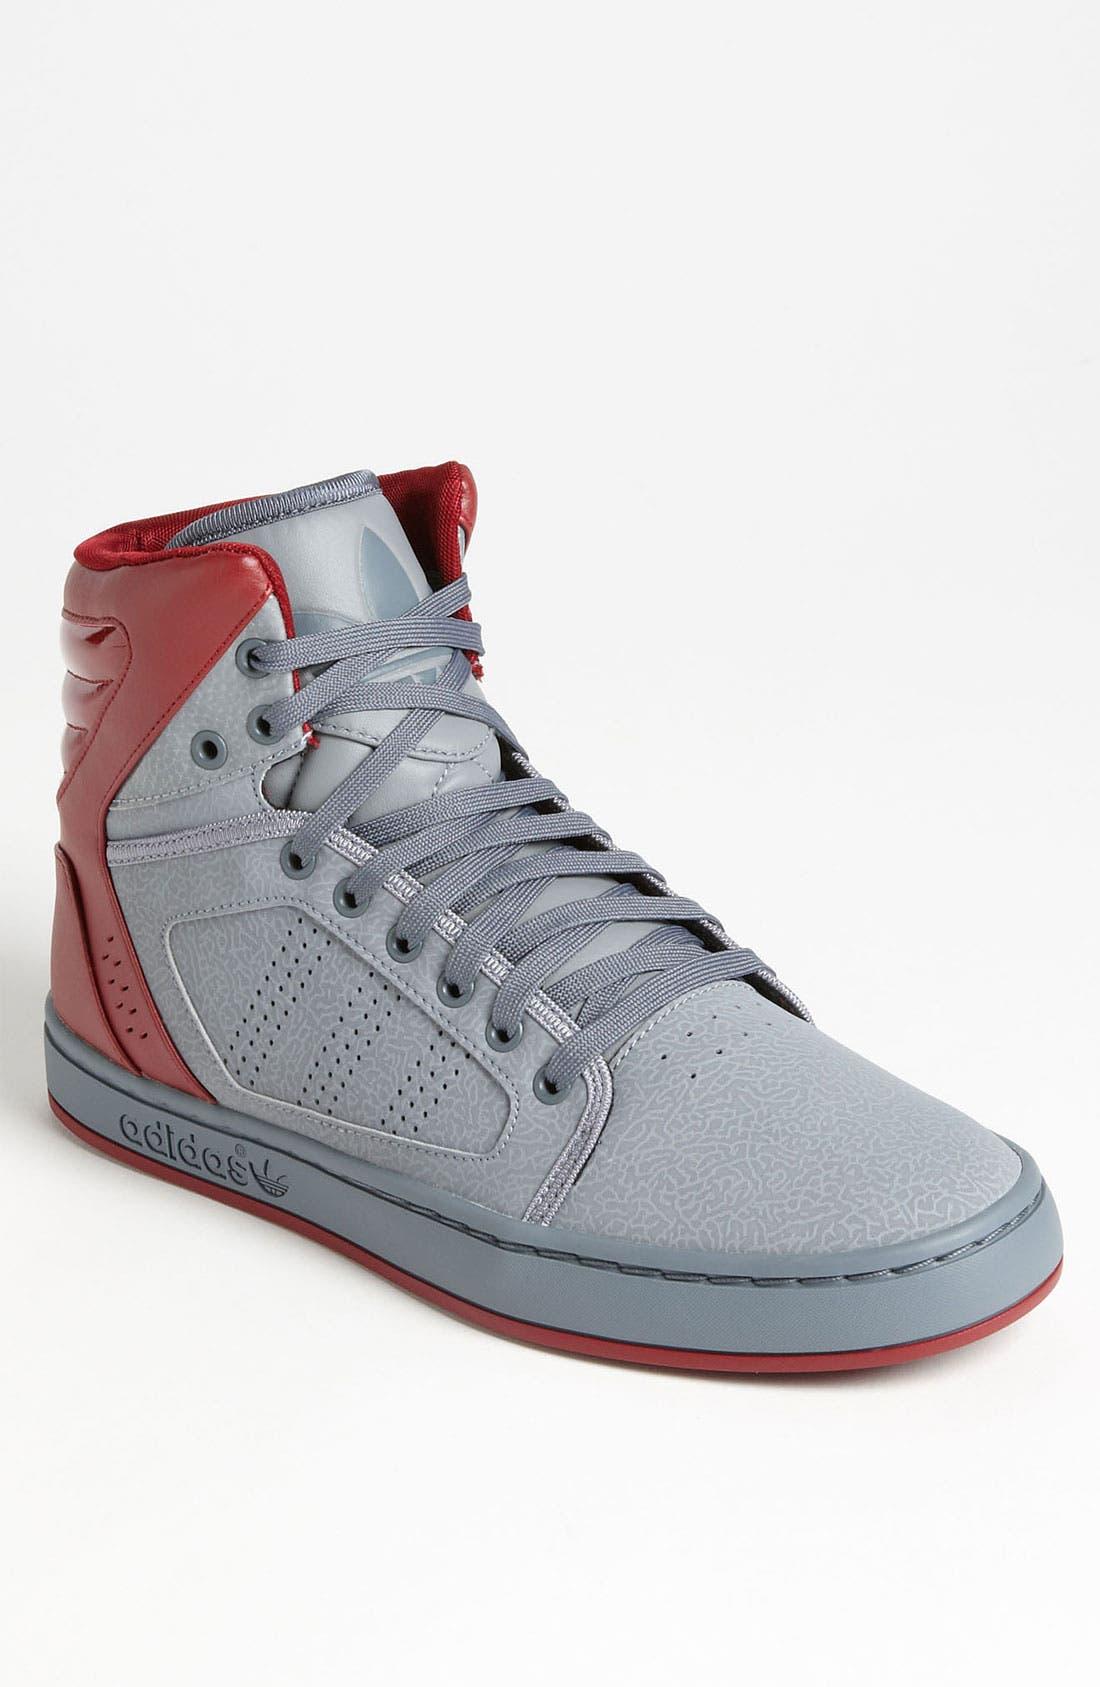 Alternate Image 1 Selected - adidas 'adiHIGH EXT' Sneaker (Men) (Online Only)